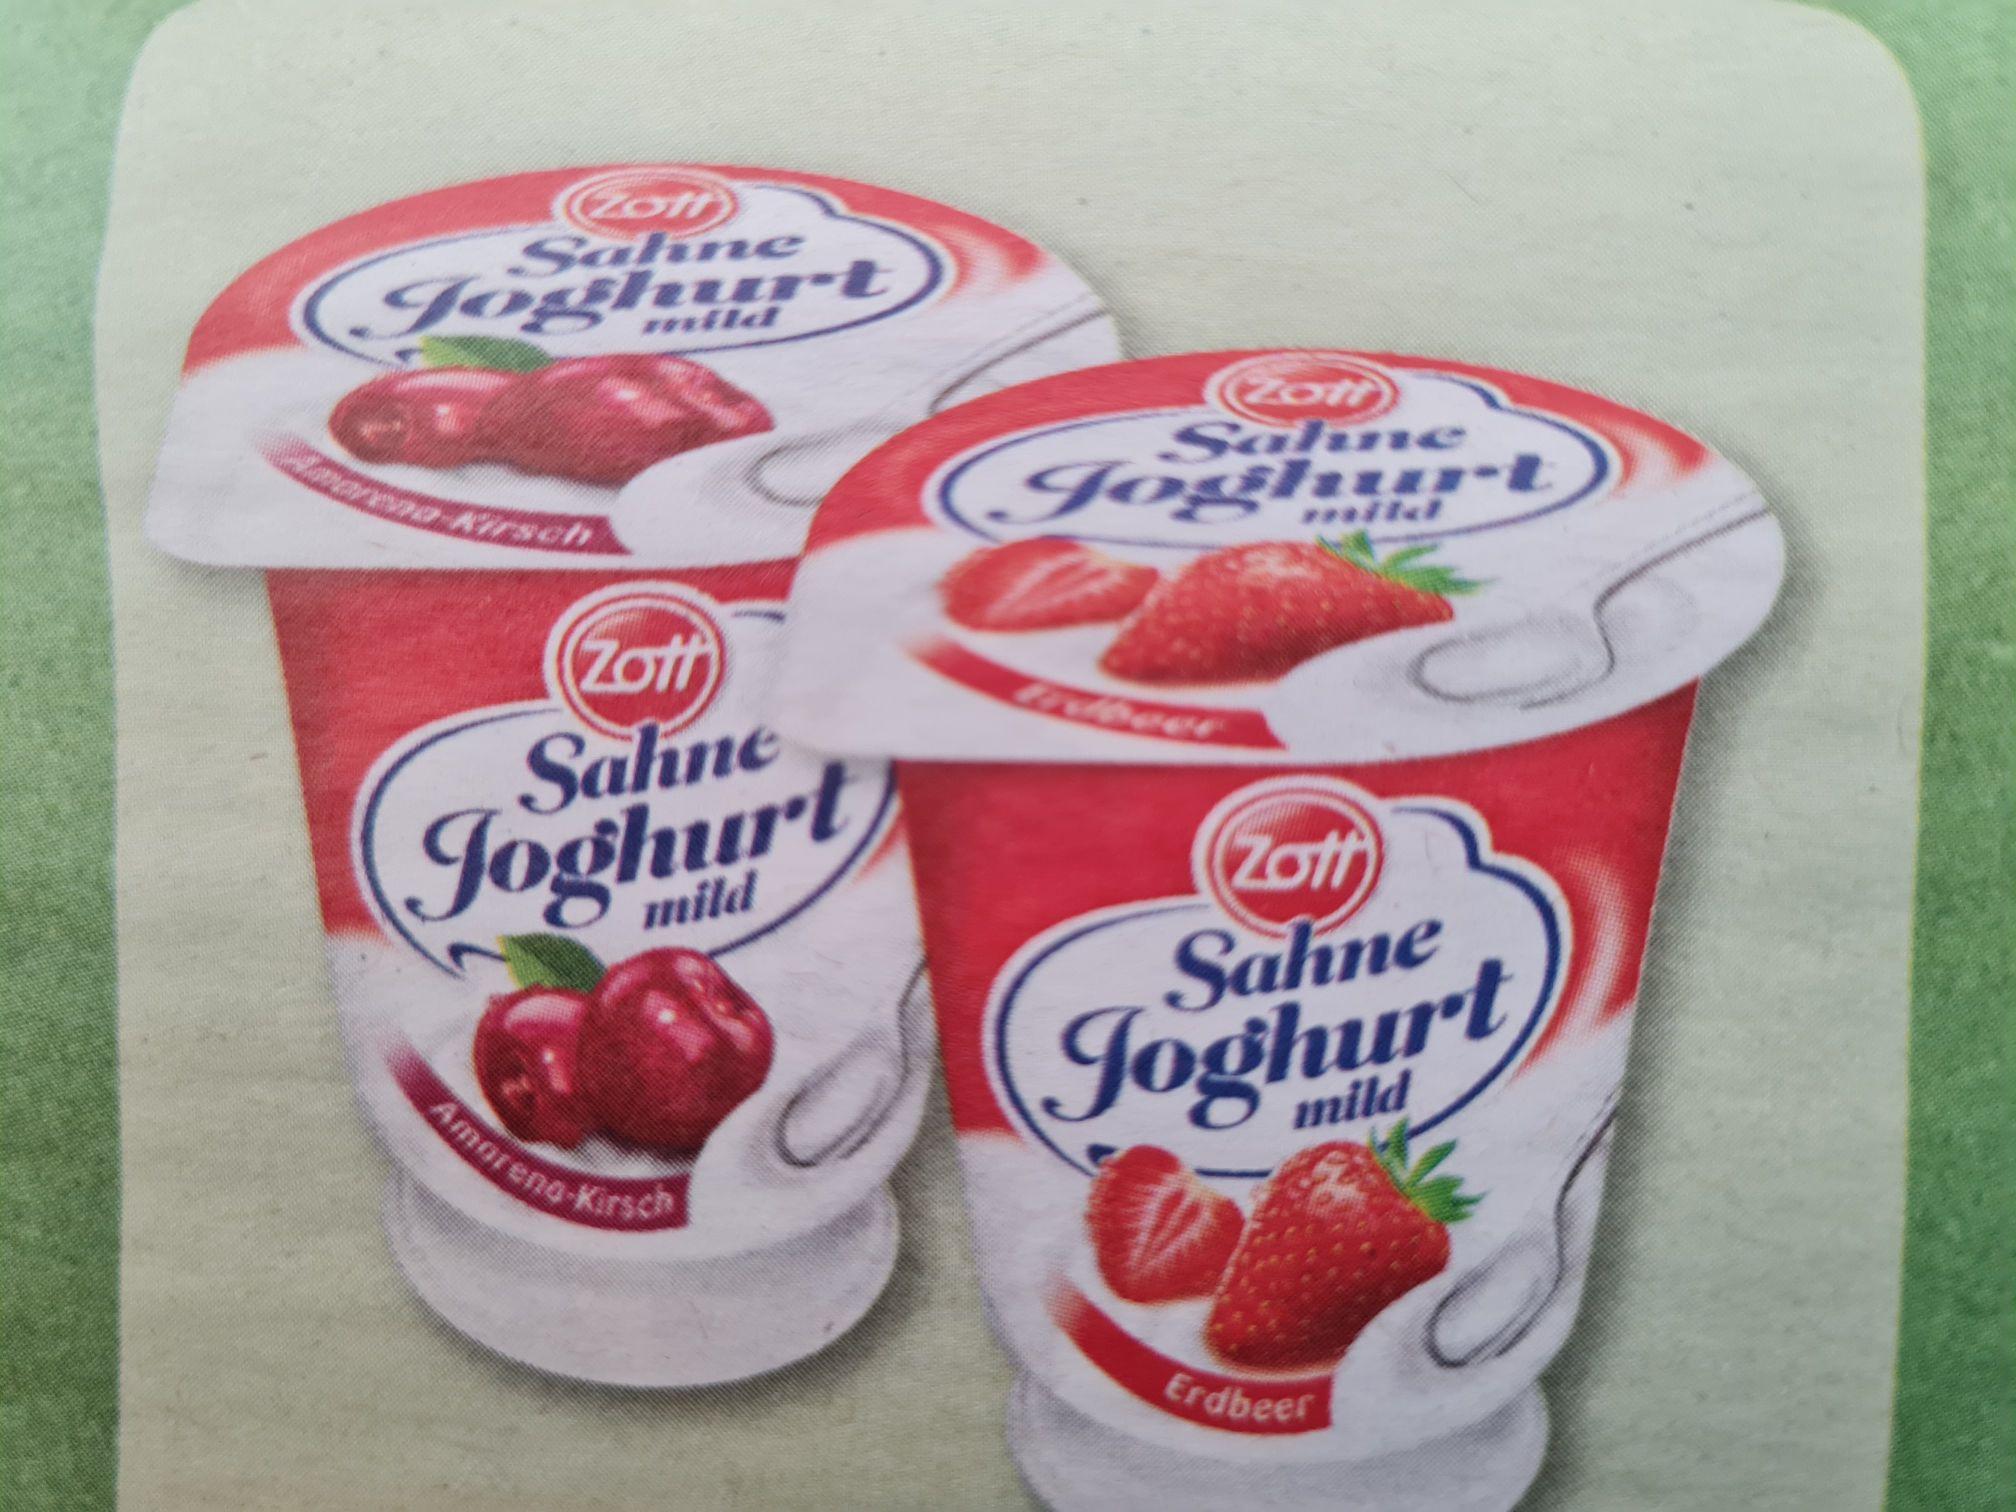 Freebie Zott Sahne Joghurt (evtl. personalisiert)